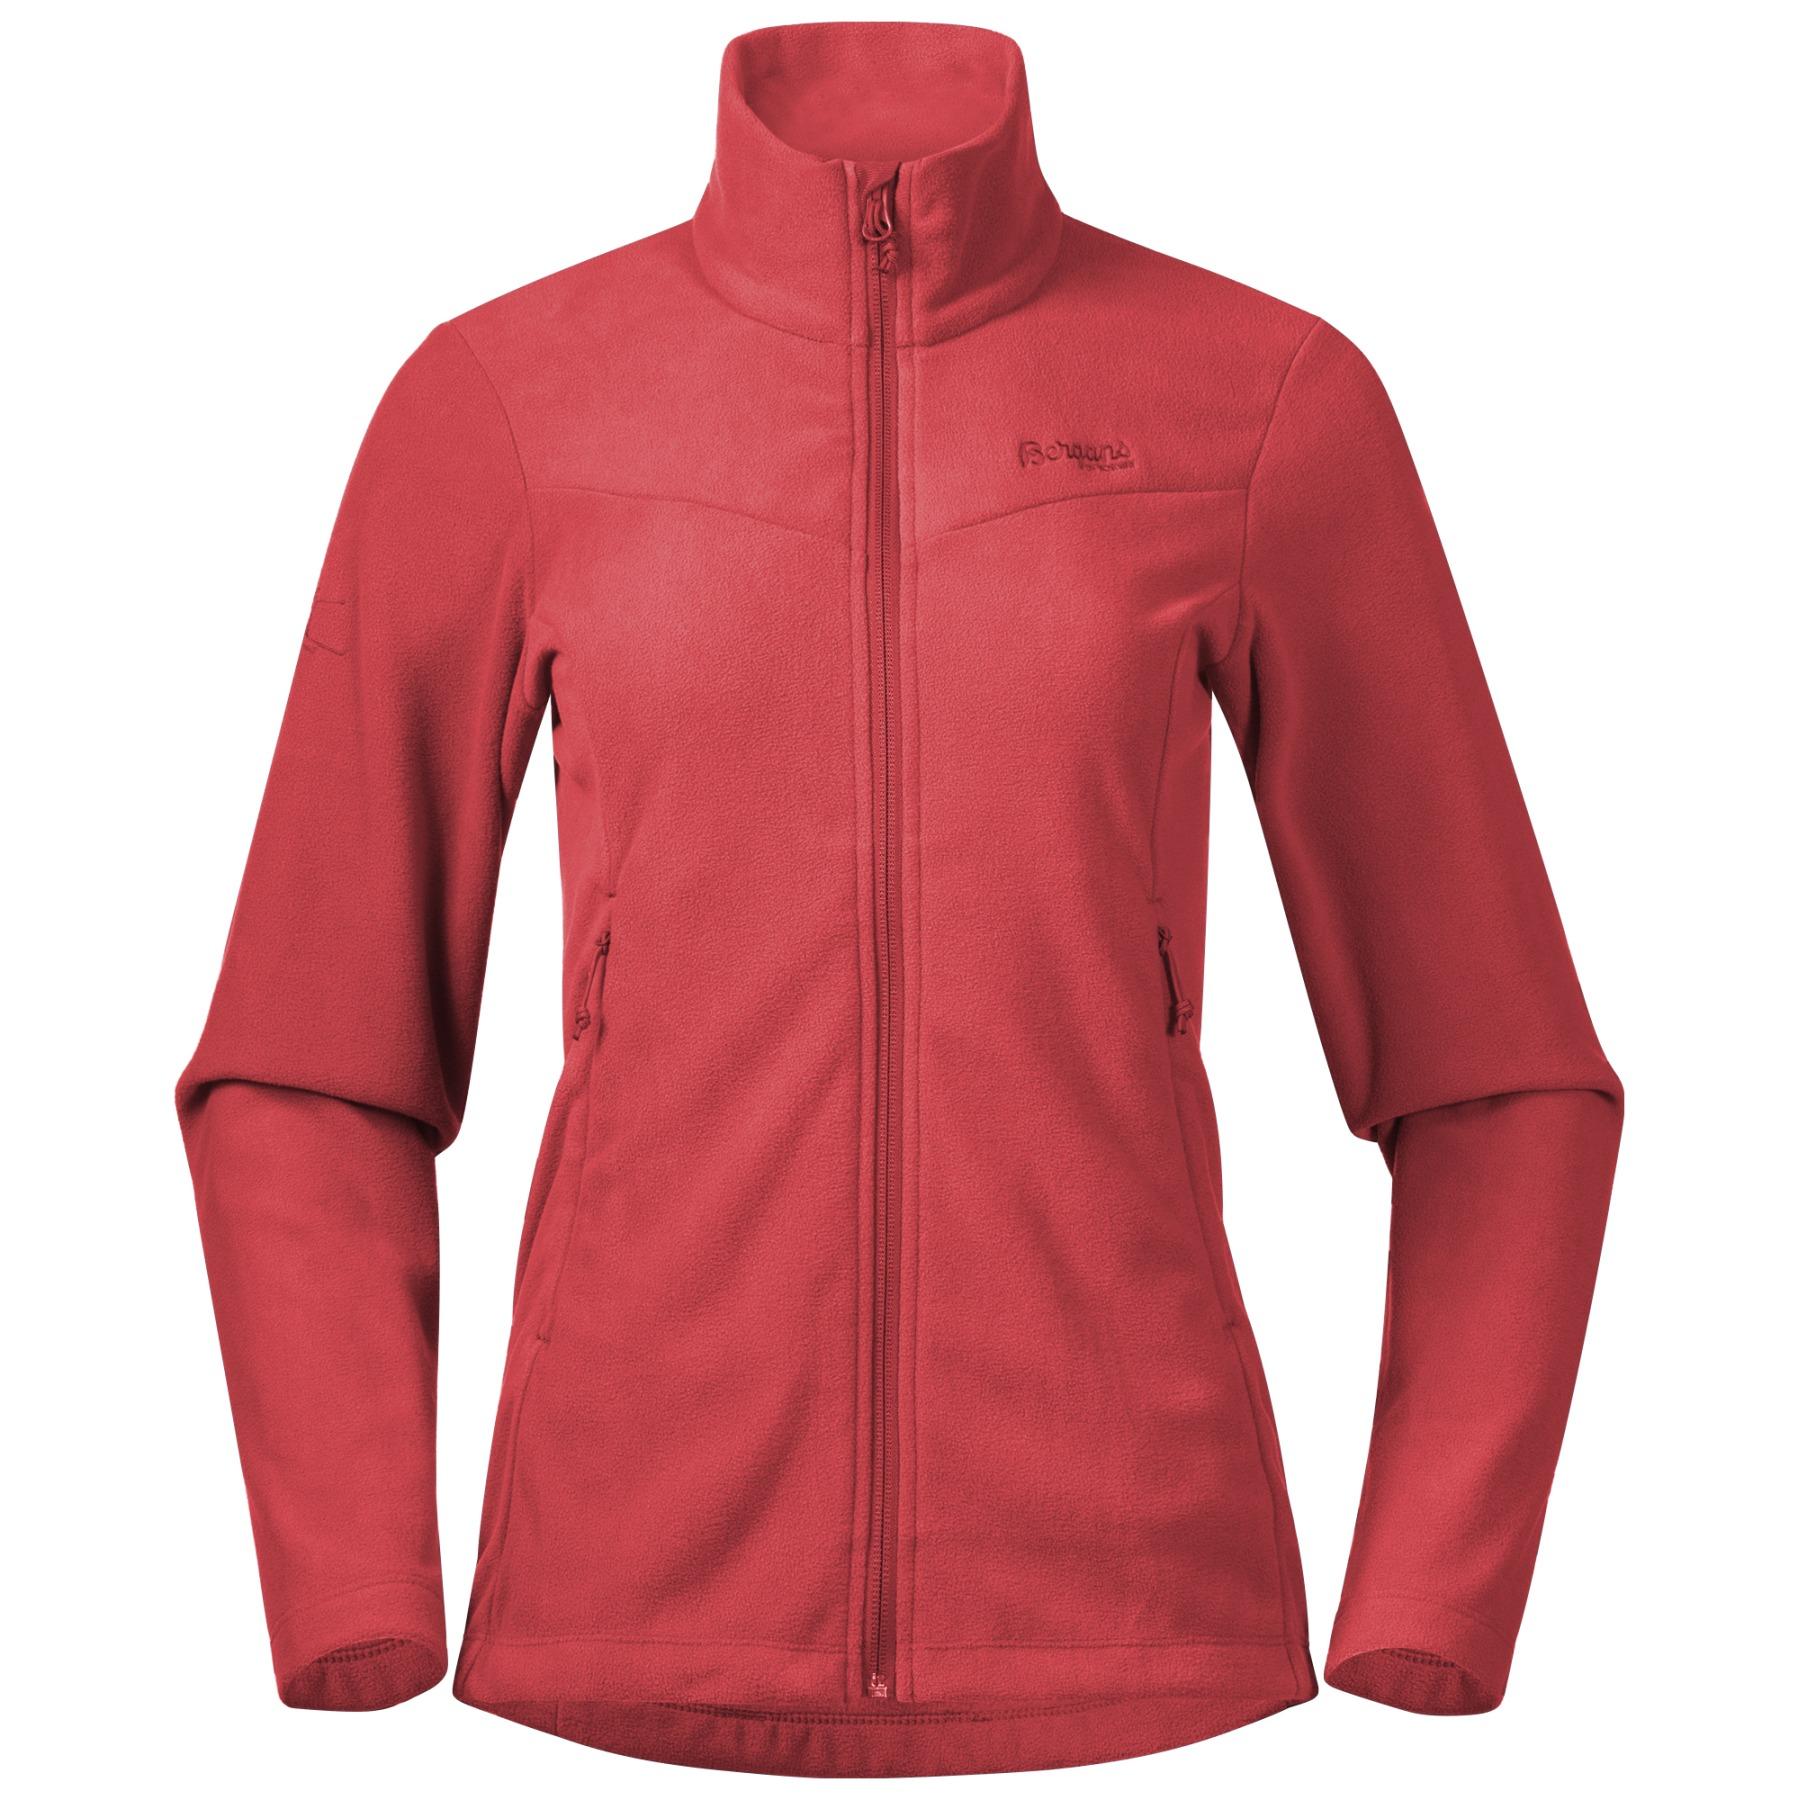 Produktbild von Bergans Finnsnes Fleece Damenjacke - light dahlia red